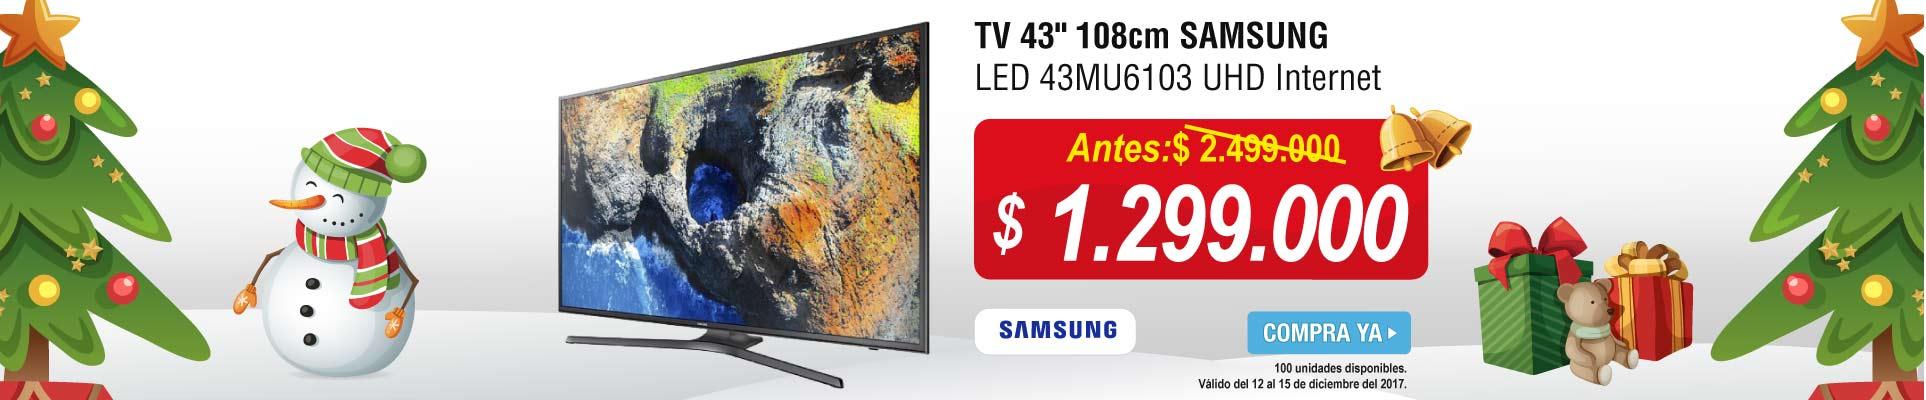 PPAL ALKP-2-tv-TV 43 108cm SAMSUNG LED 43MU6103 UHD Internet-prod-diciembre13-15